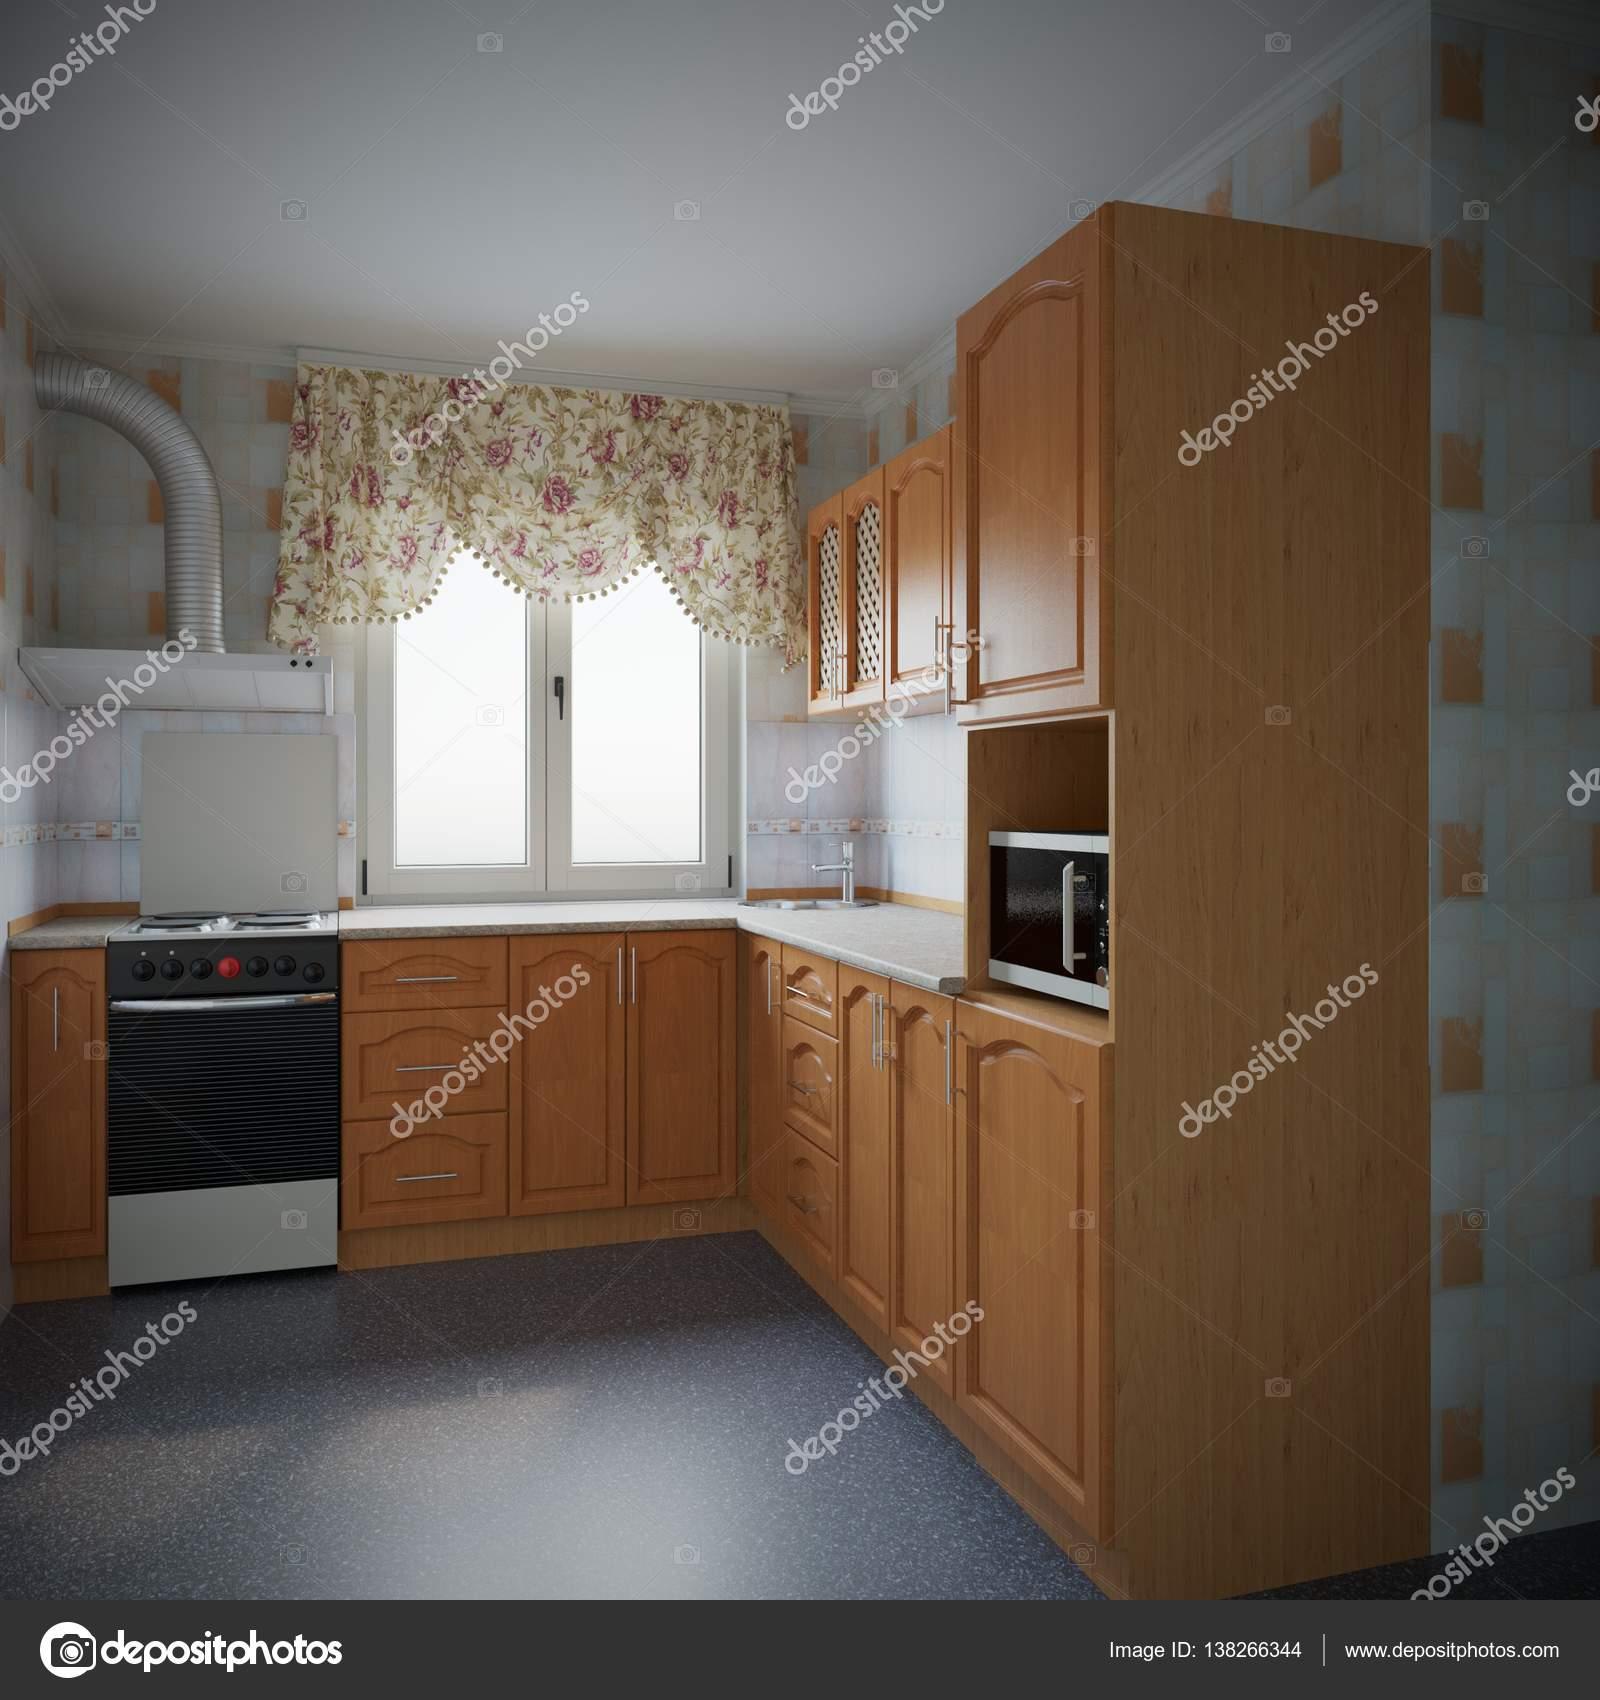 https://st3.depositphotos.com/2734453/13826/i/1600/depositphotos_138266344-stock-photo-3d-kitchen-interior-in-warm.jpg